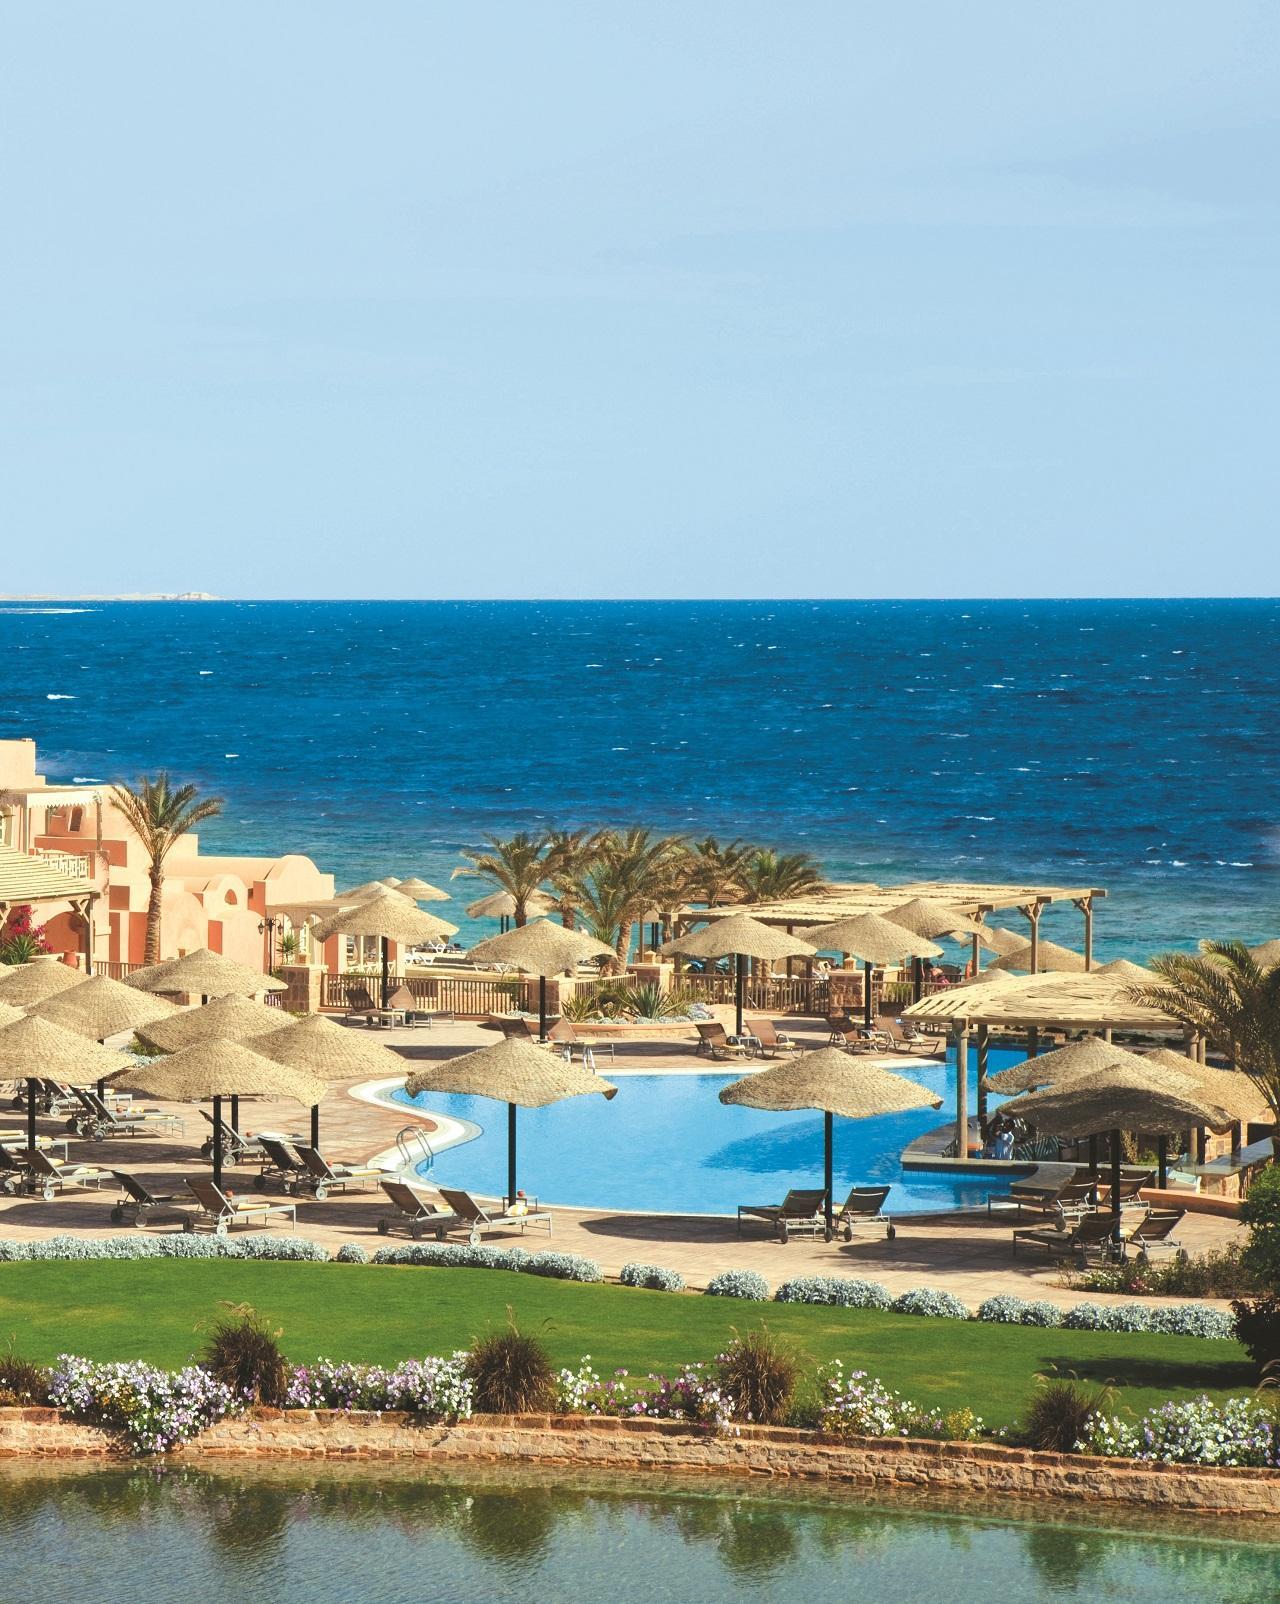 Radisson Blu Resort El Quseir 4* (4*)